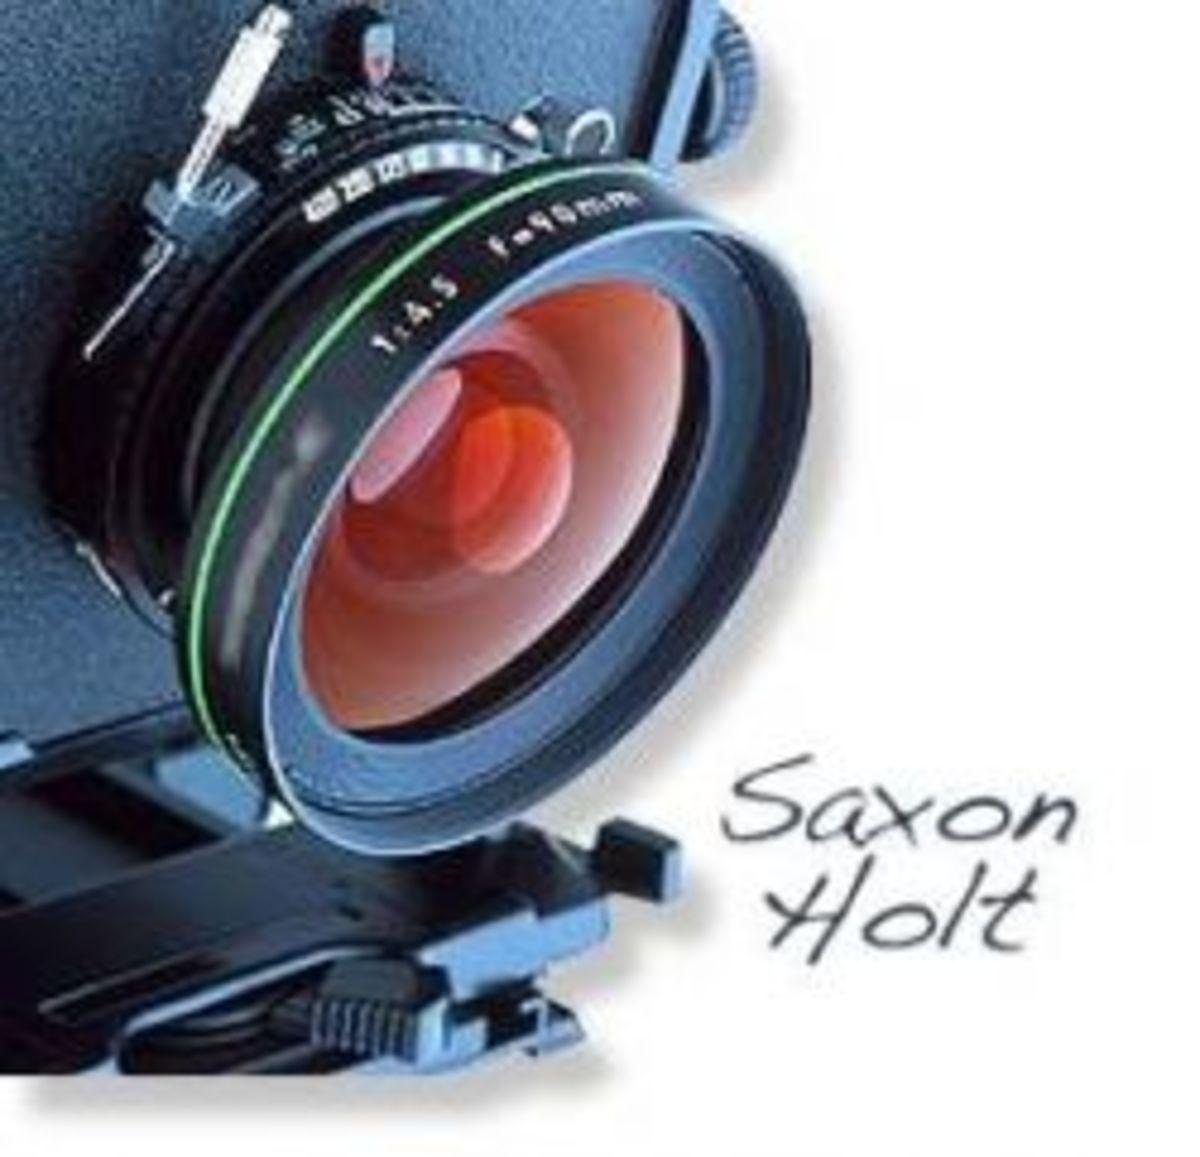 Saxon Holt, Garden Photographer Extraordinaire